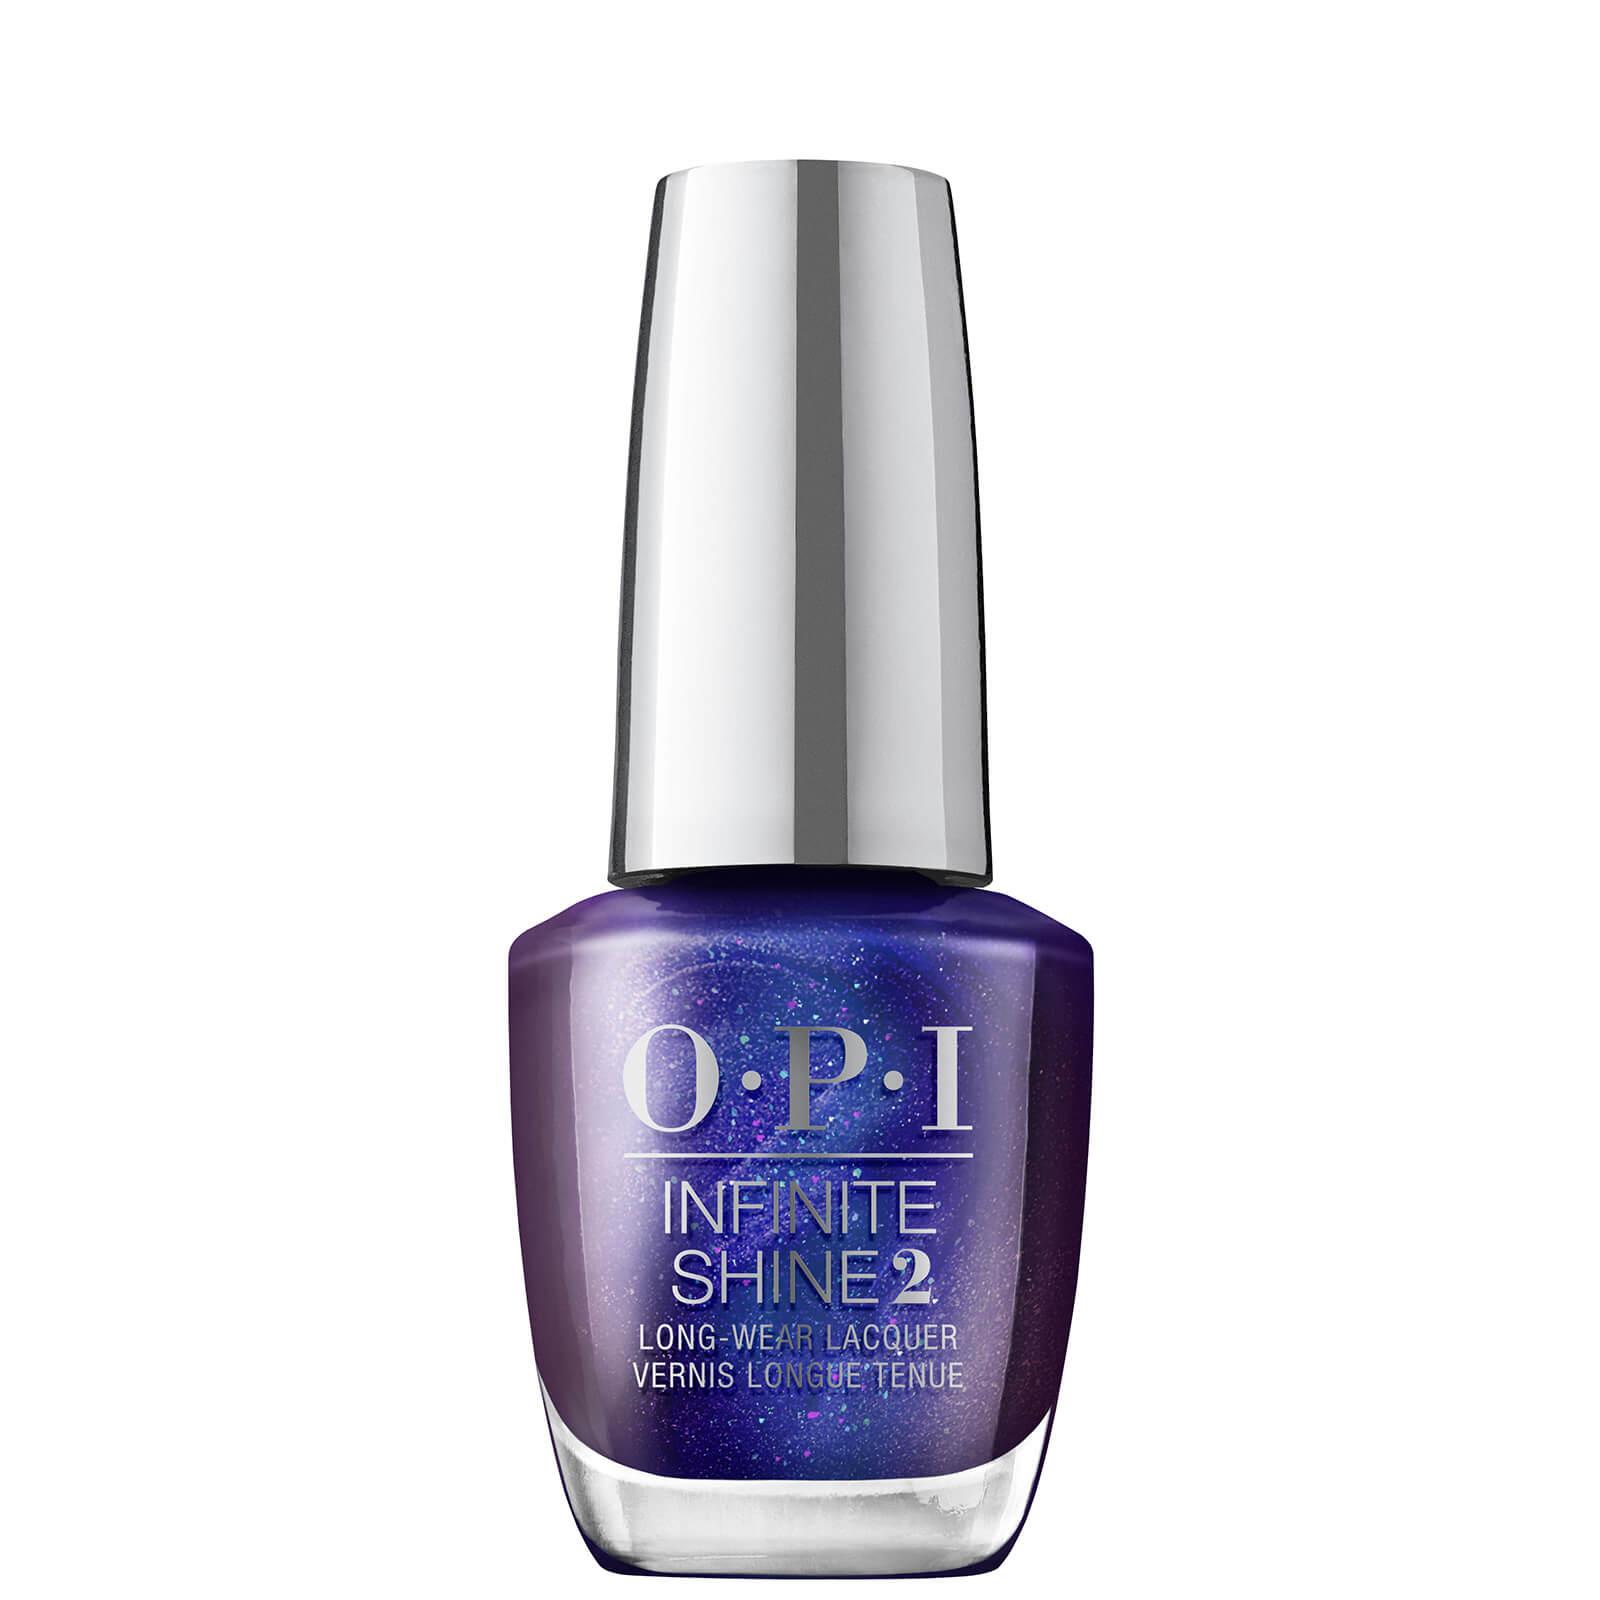 Купить OPI DTLA Collection Infinite Shine Long-wear Nail Polish 15ml (Various Shades) - Abstract After Dark